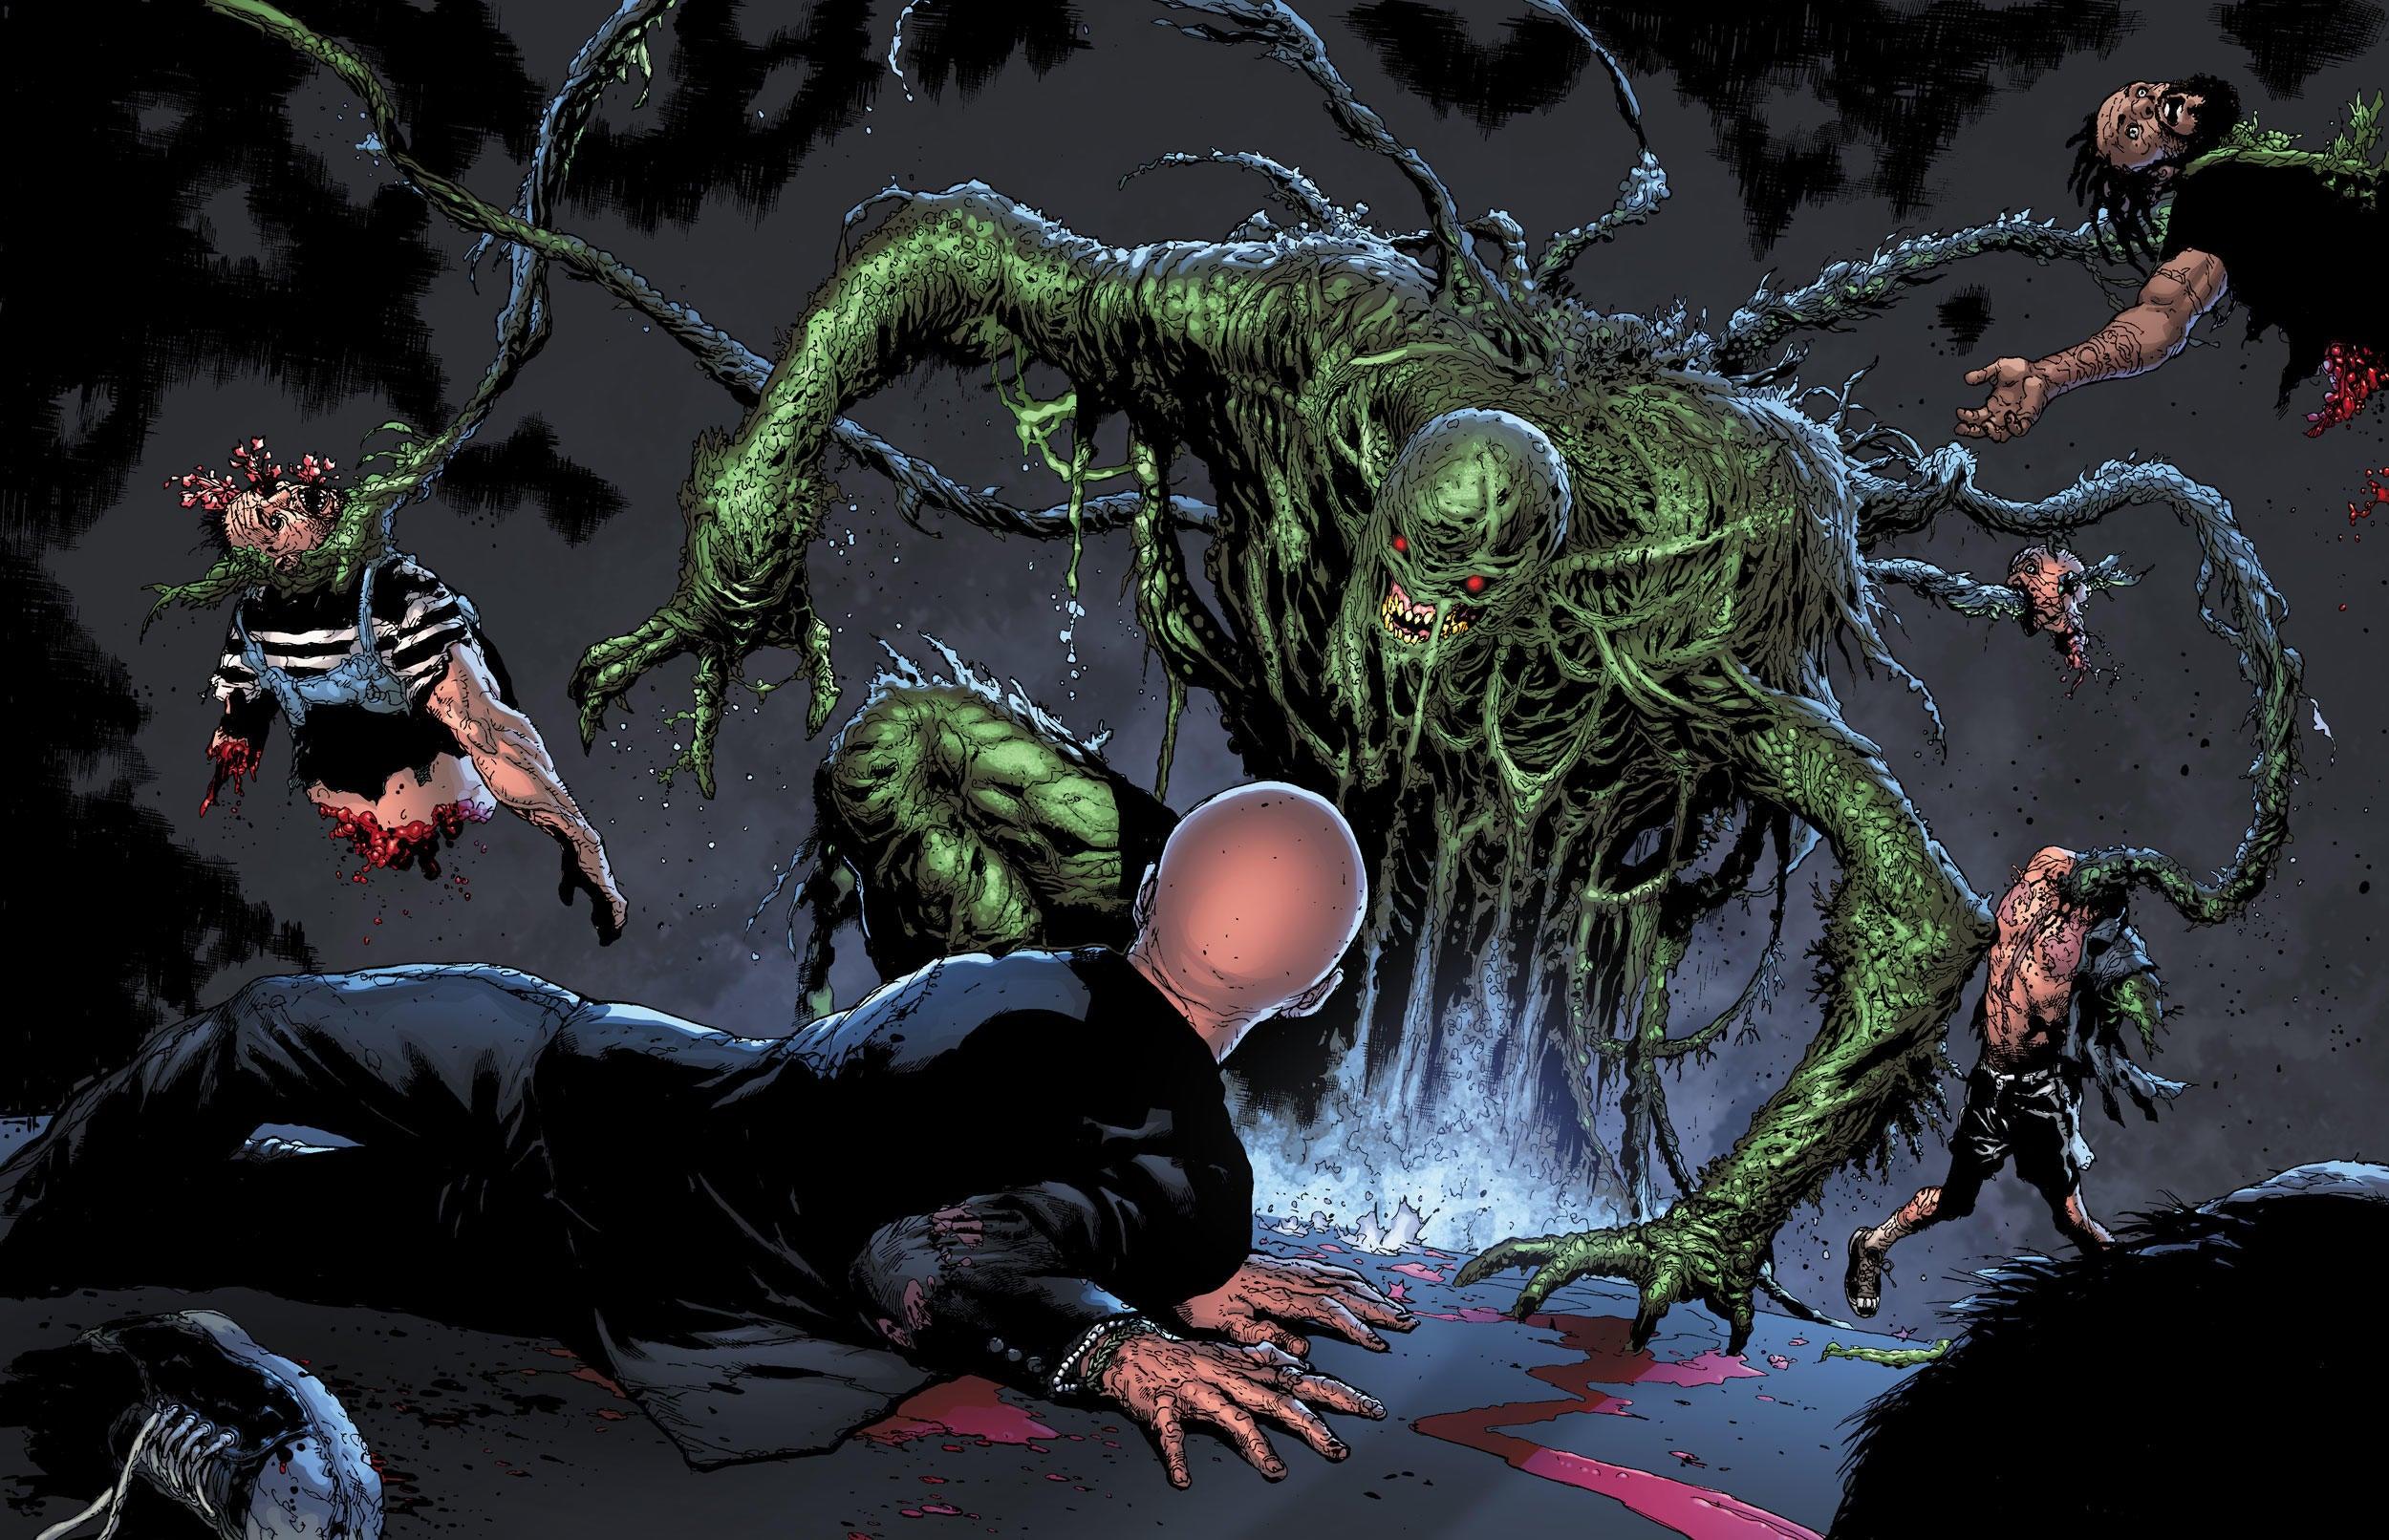 swamp-thing-green-hell-1-24.jpg